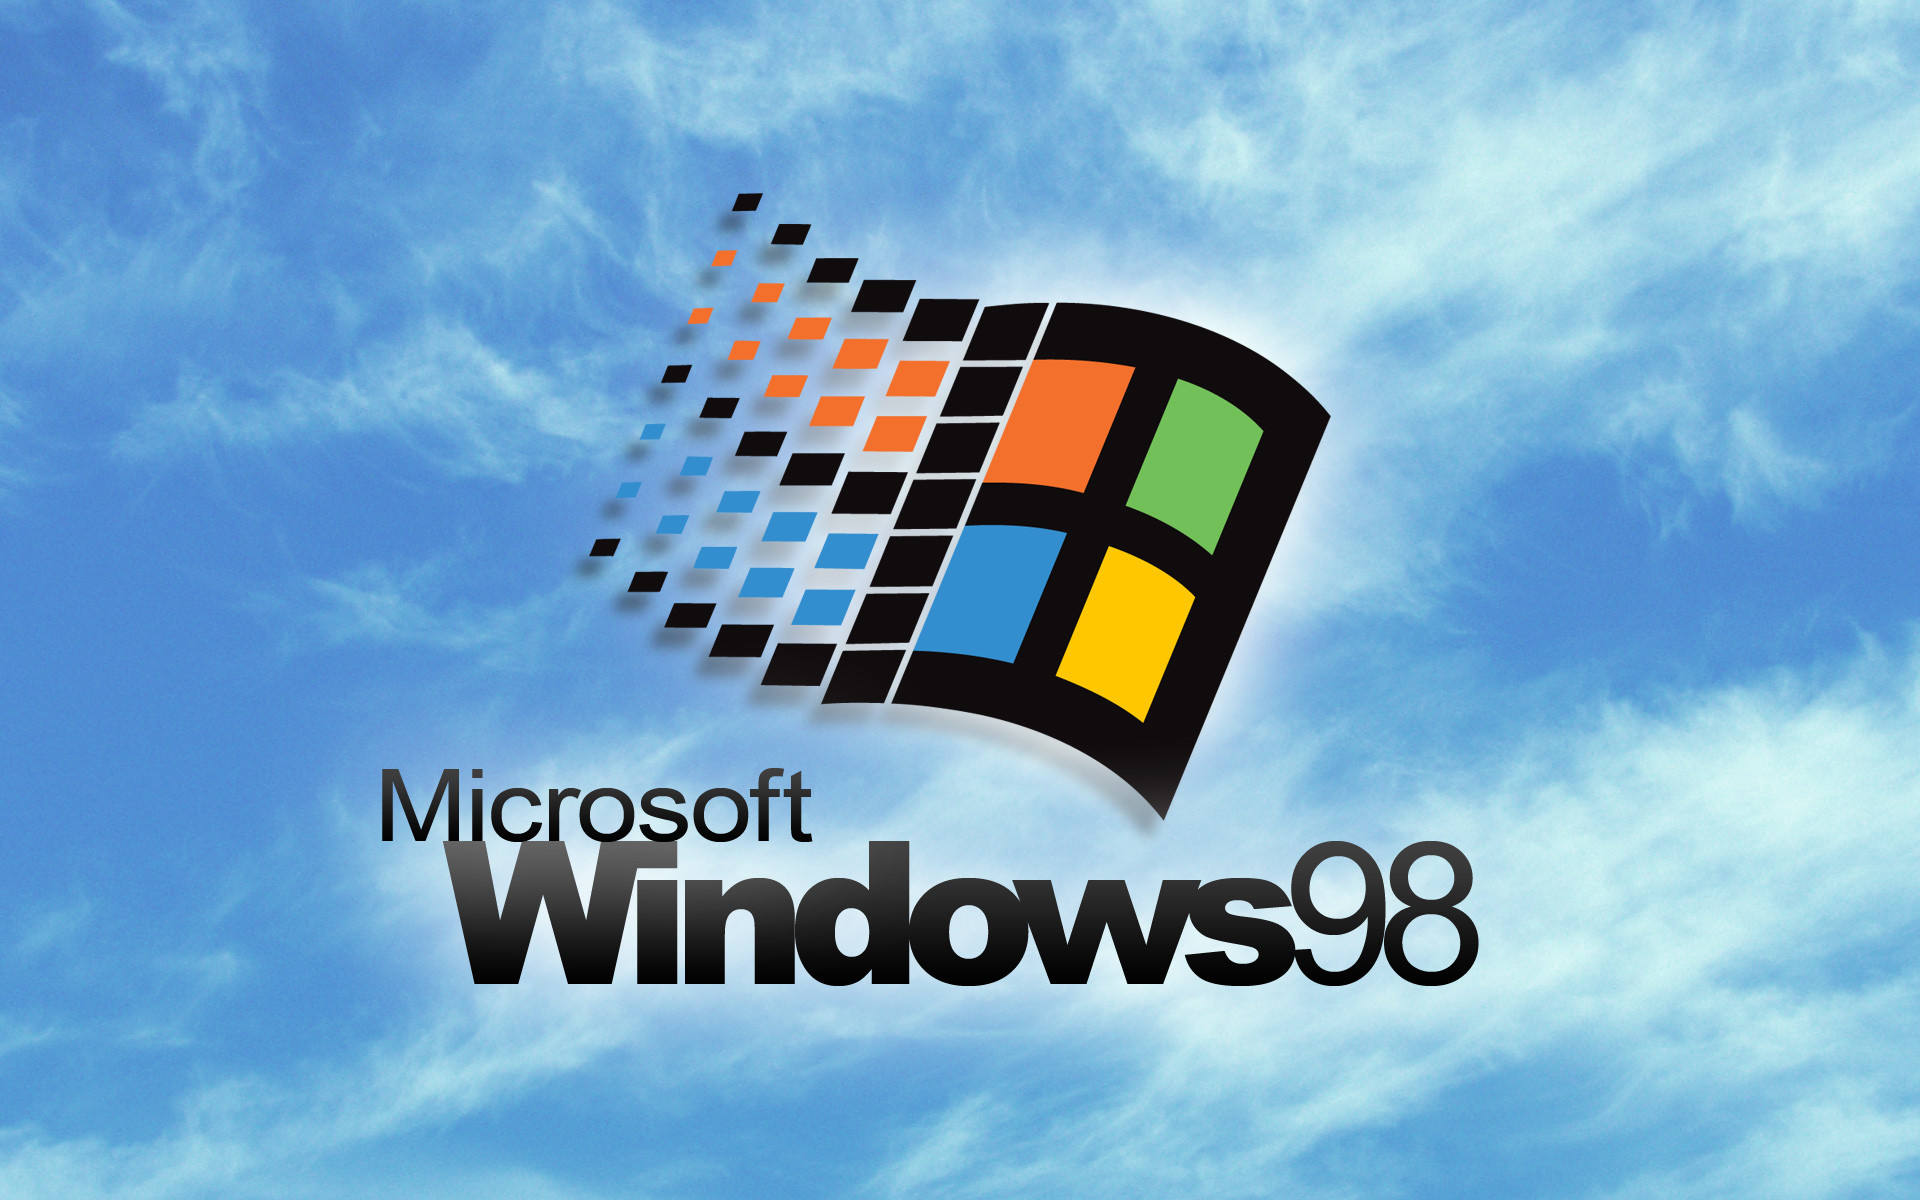 1920x1200 Windows 98 Loading Screen Wallpaper